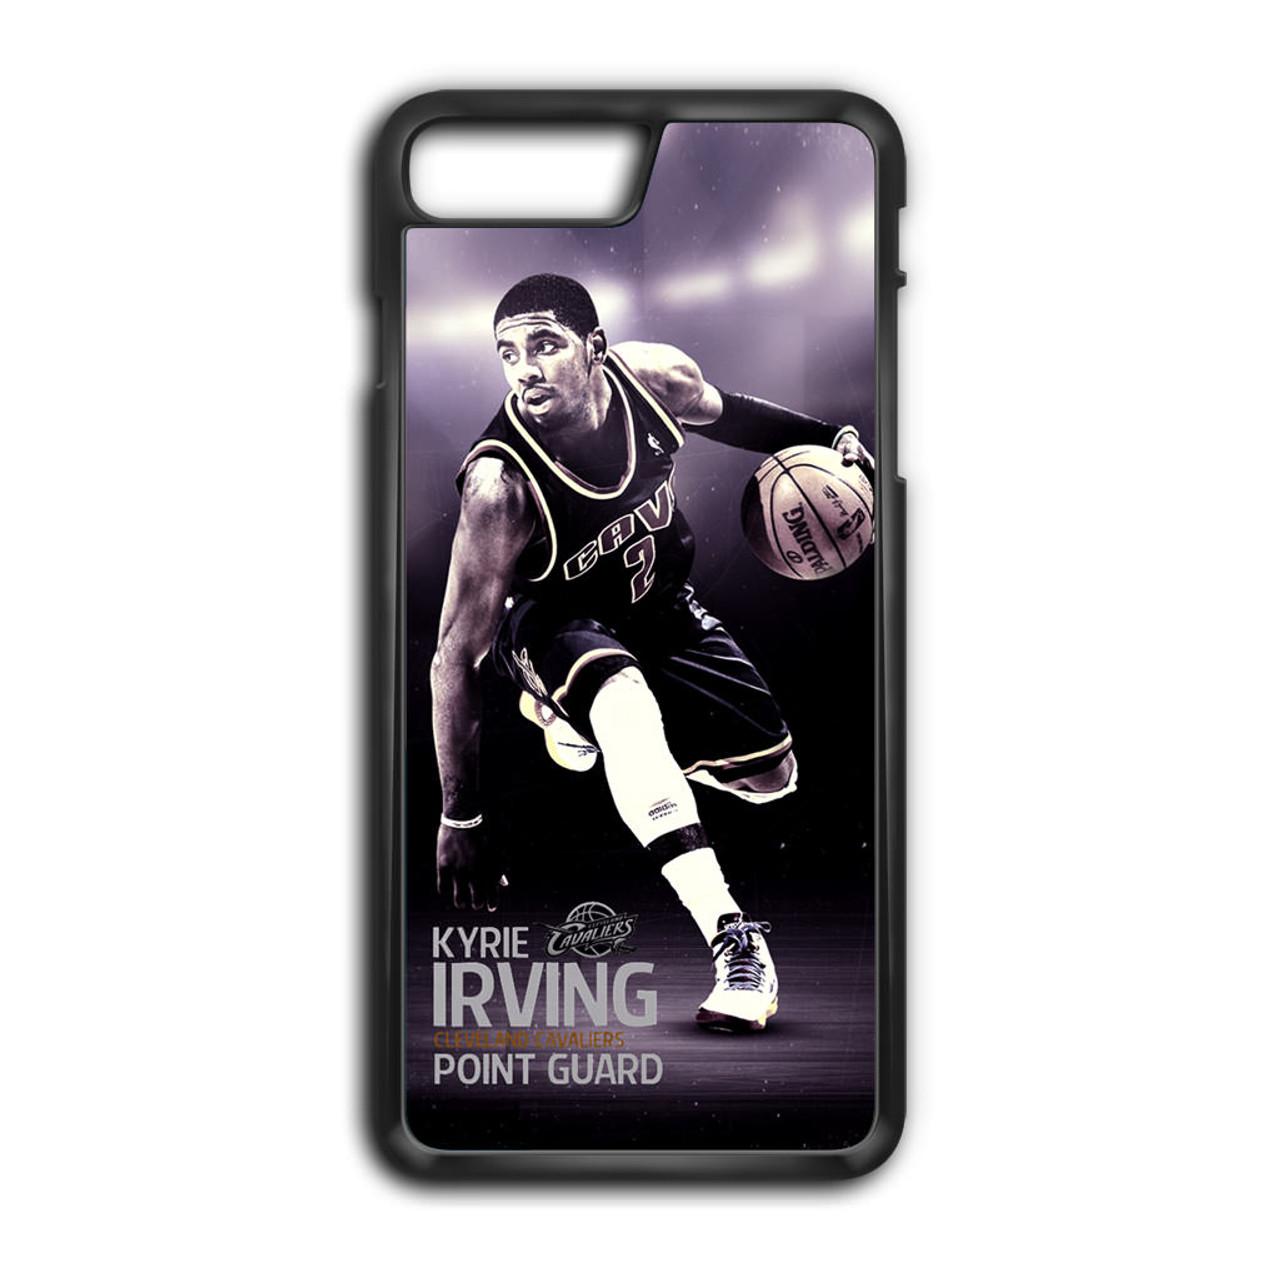 b72d62a0d Cleveland Cavaliers Kyrie Irving iPhone 7 Plus Case